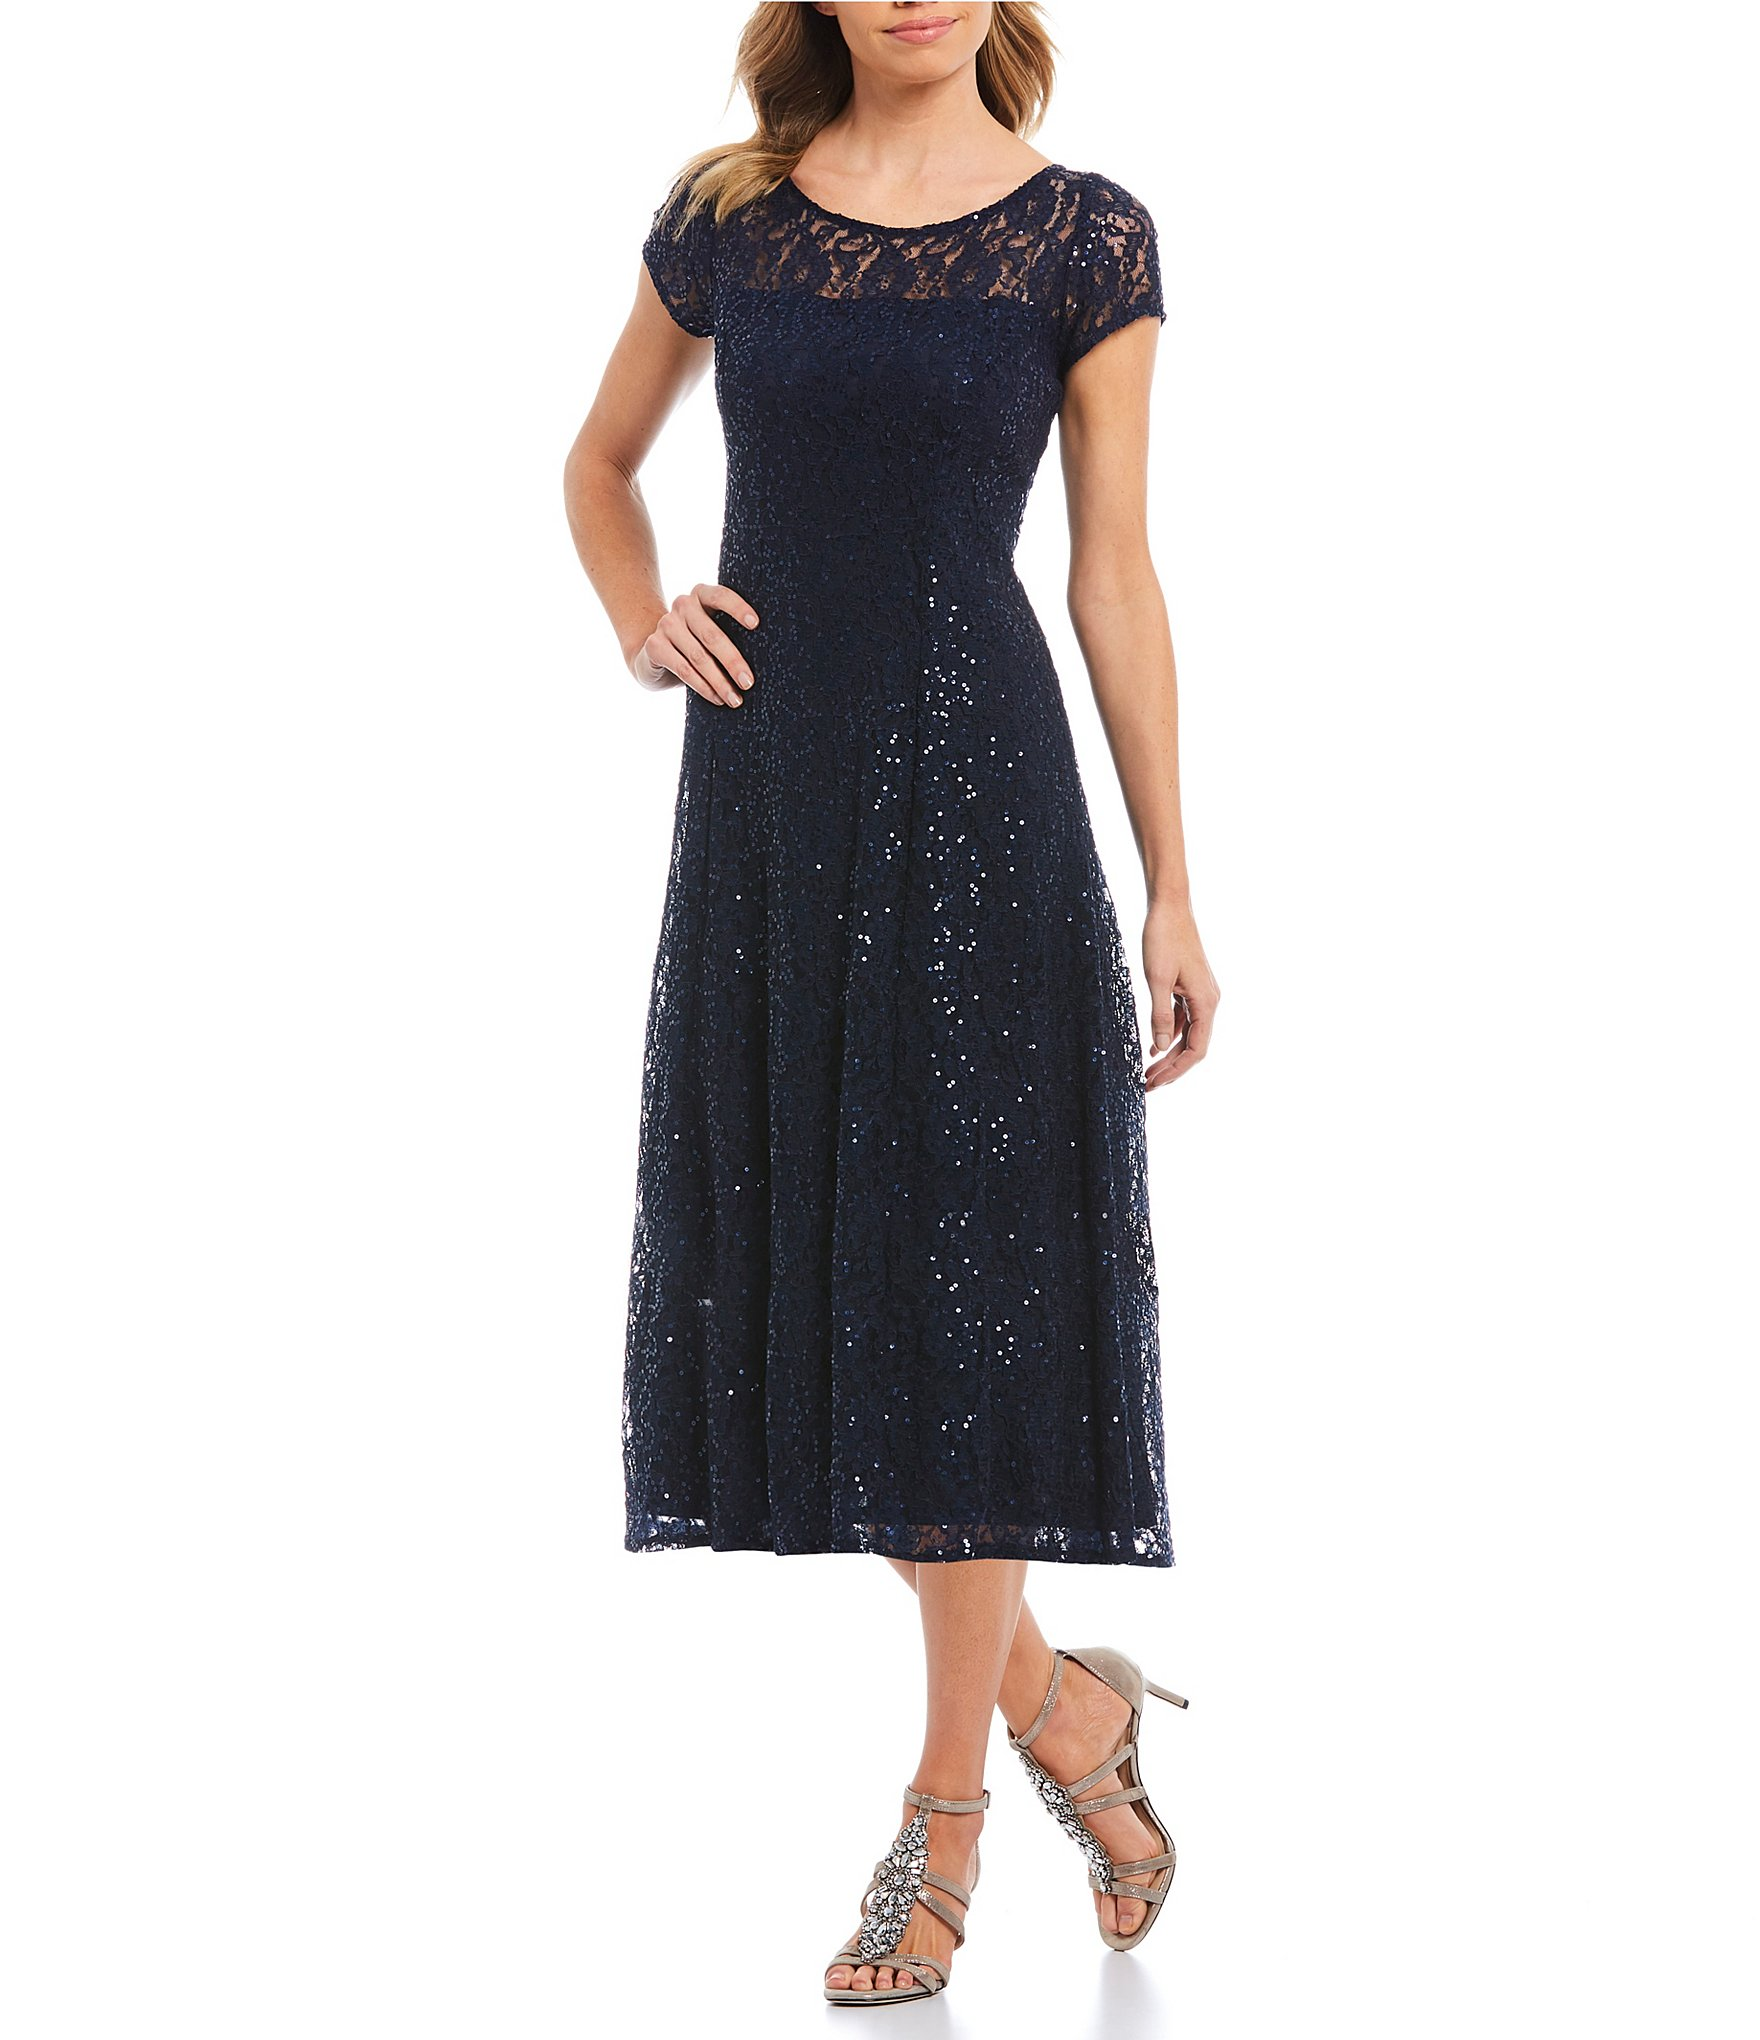 Petite midi dress with sleeves